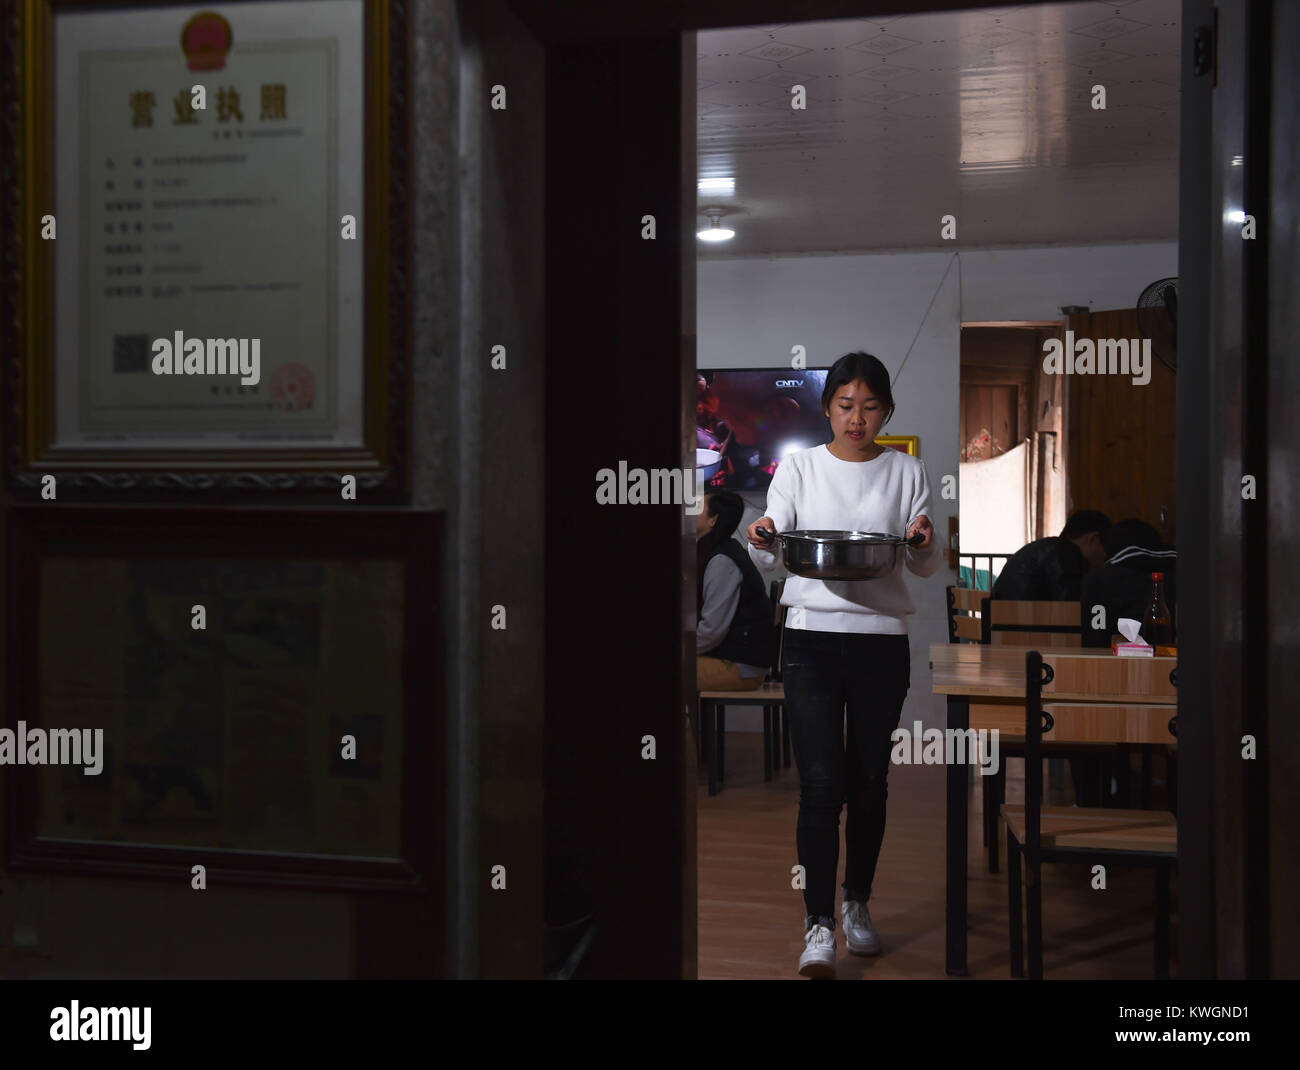 (180104) -- NAN'AN, Jan. 4, 2018 (Xinhua) -- Guo Weilan works at the noodle shop in Pendao Village of Penghua Township Stock Photo